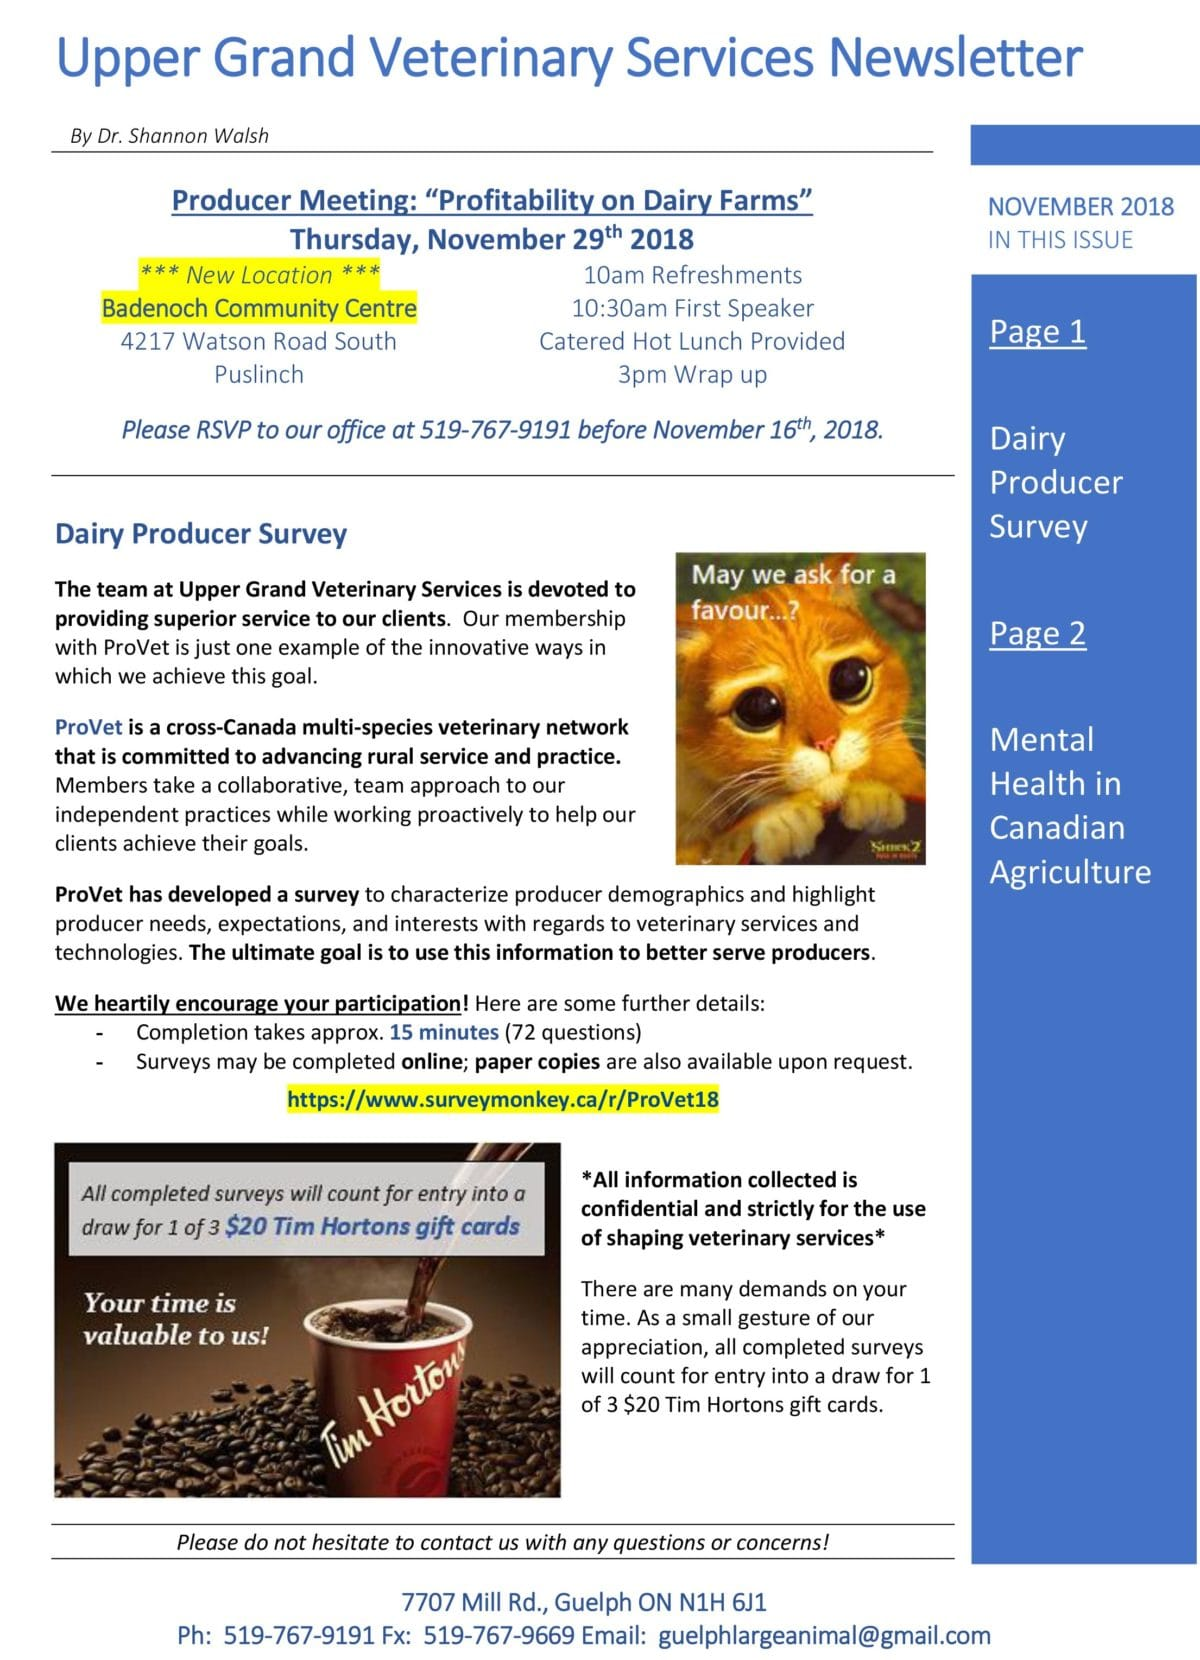 UGVS-Nov-2018-Newsletter-1-copy-1200x1660.jpg